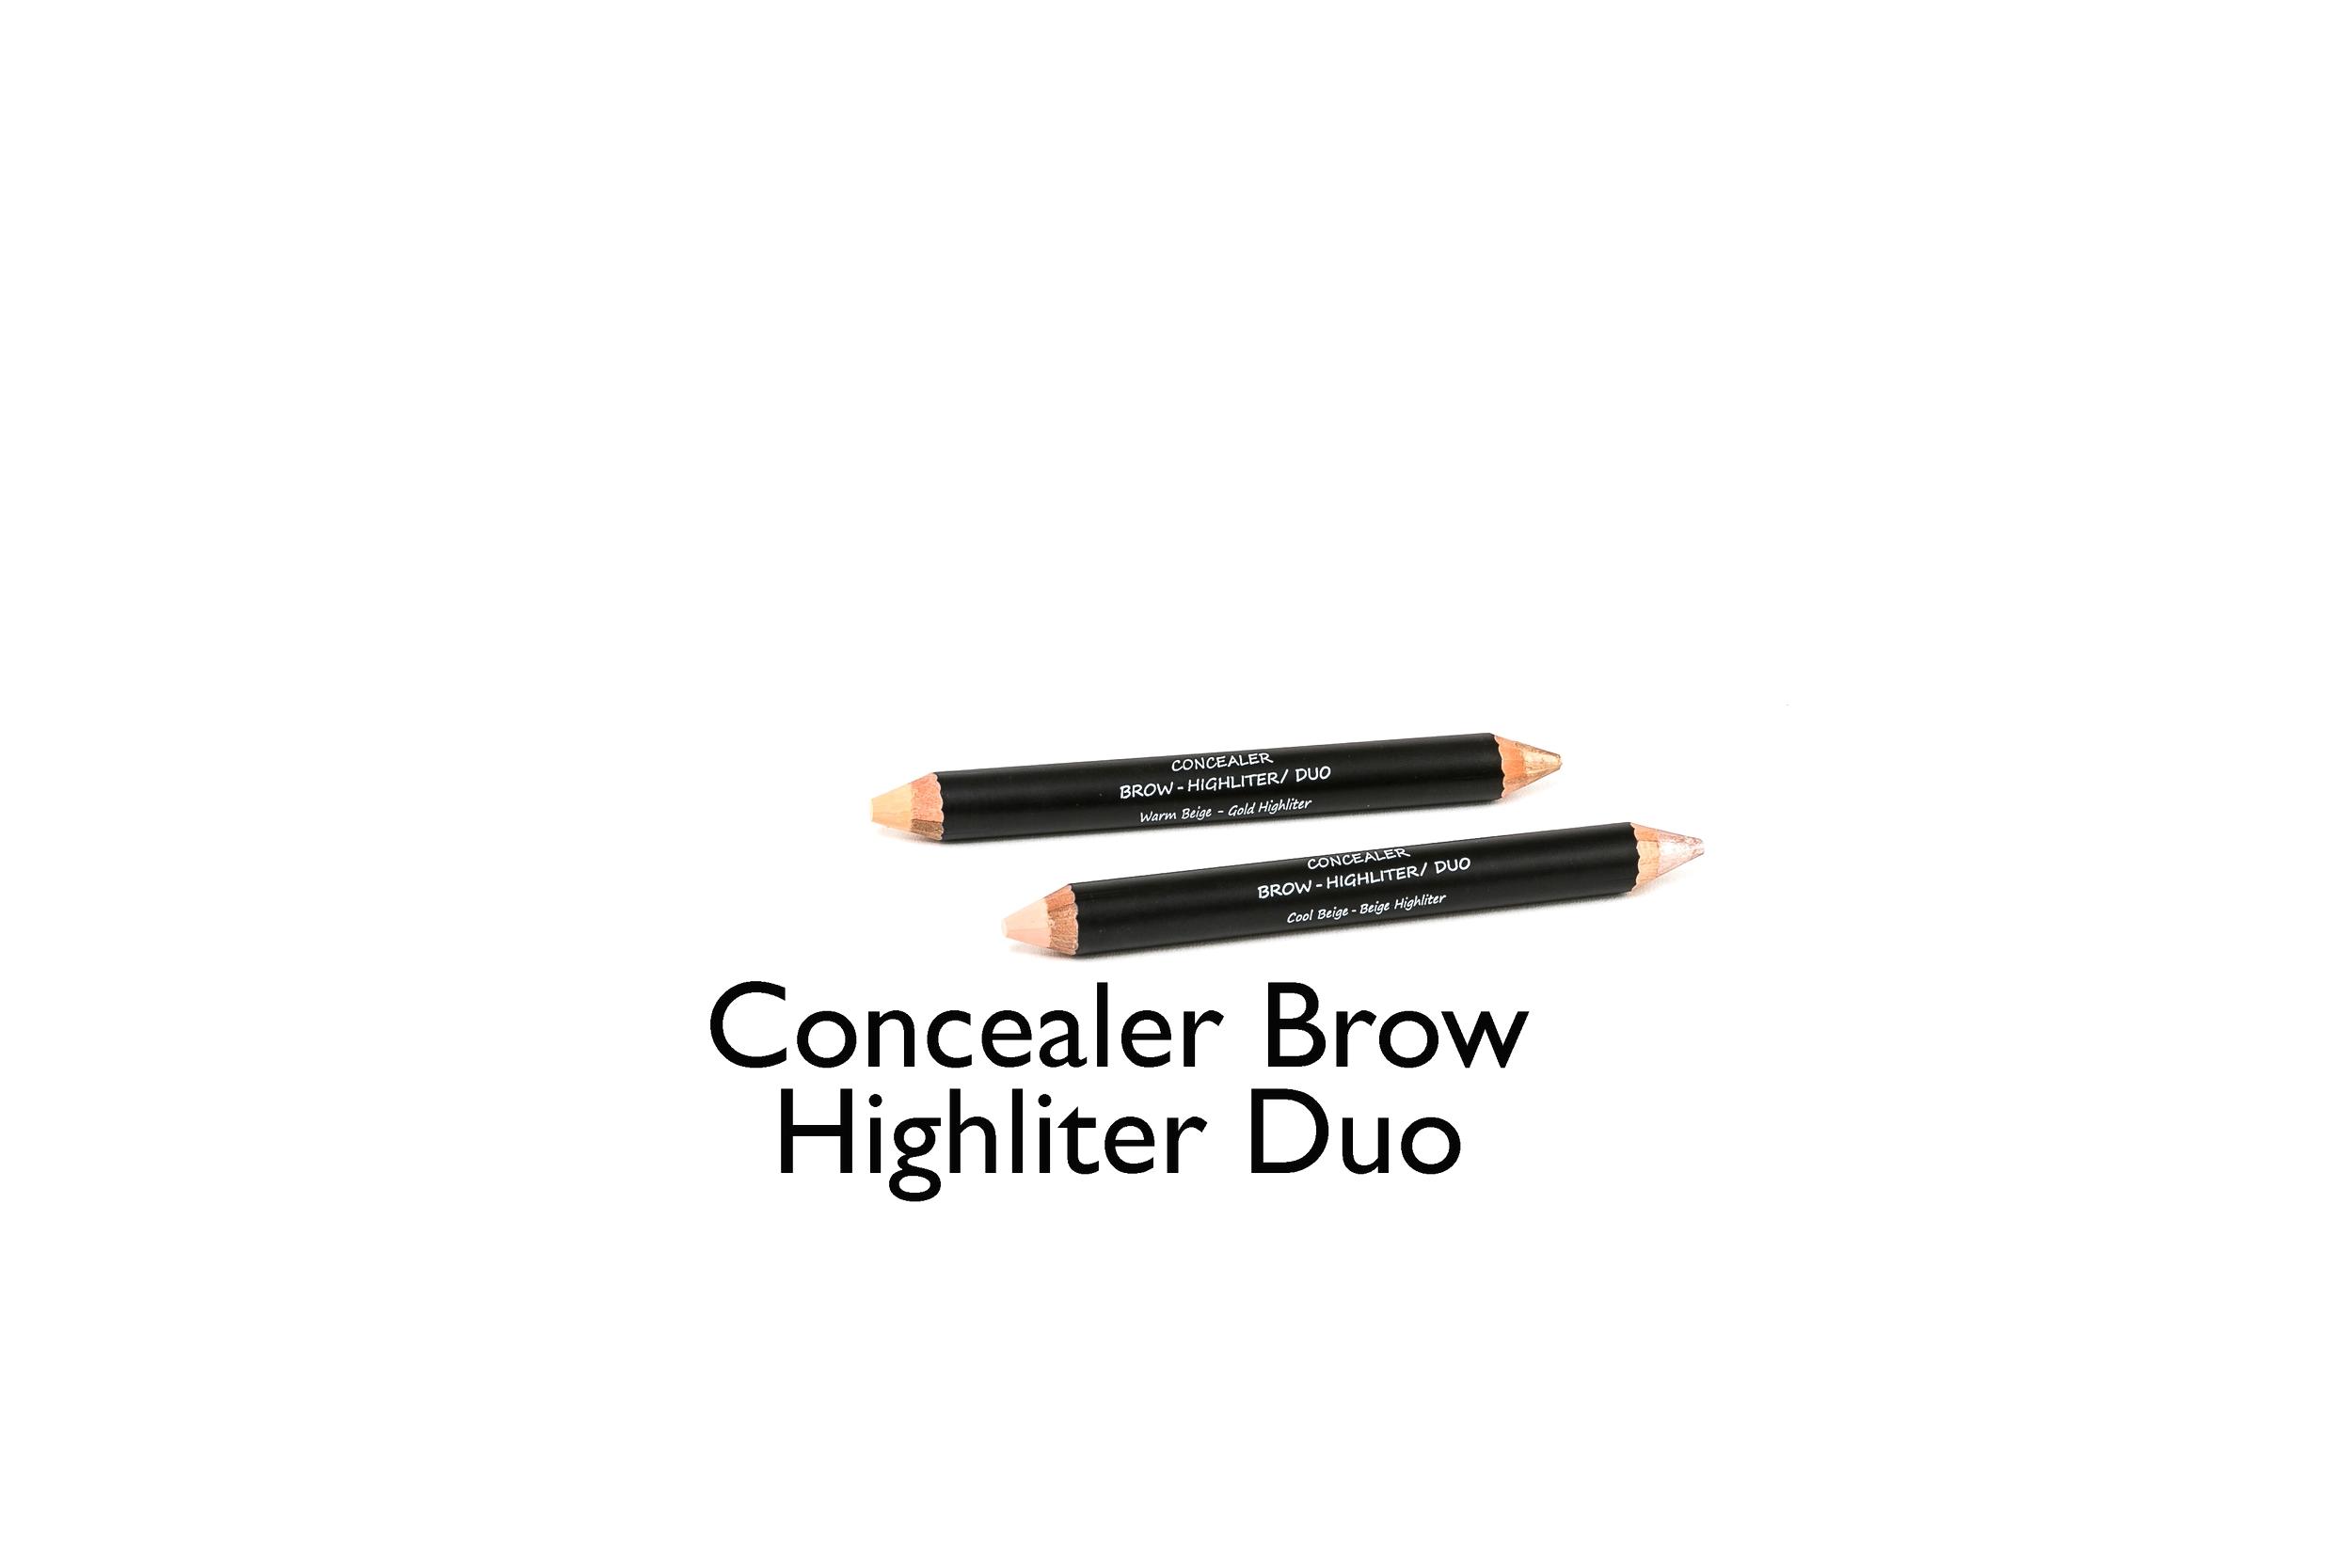 Concealer Brow Highliter Duo